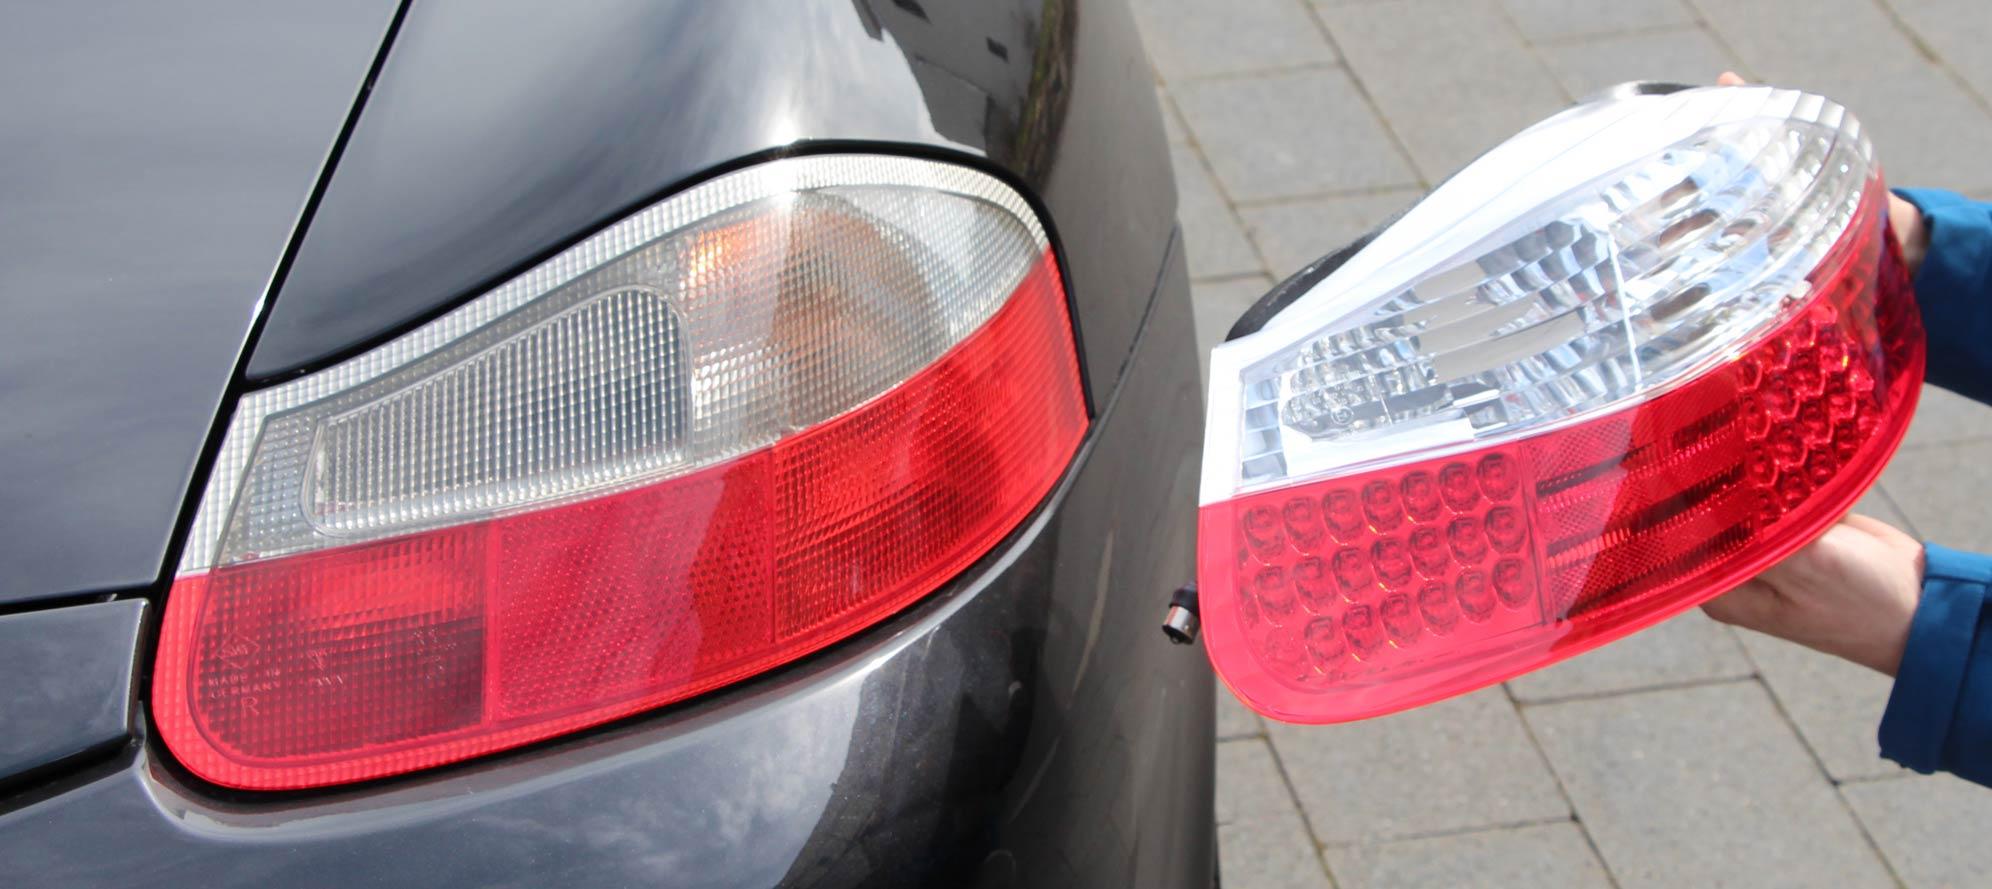 Comparaison Phares Boxster 986 LED et normal